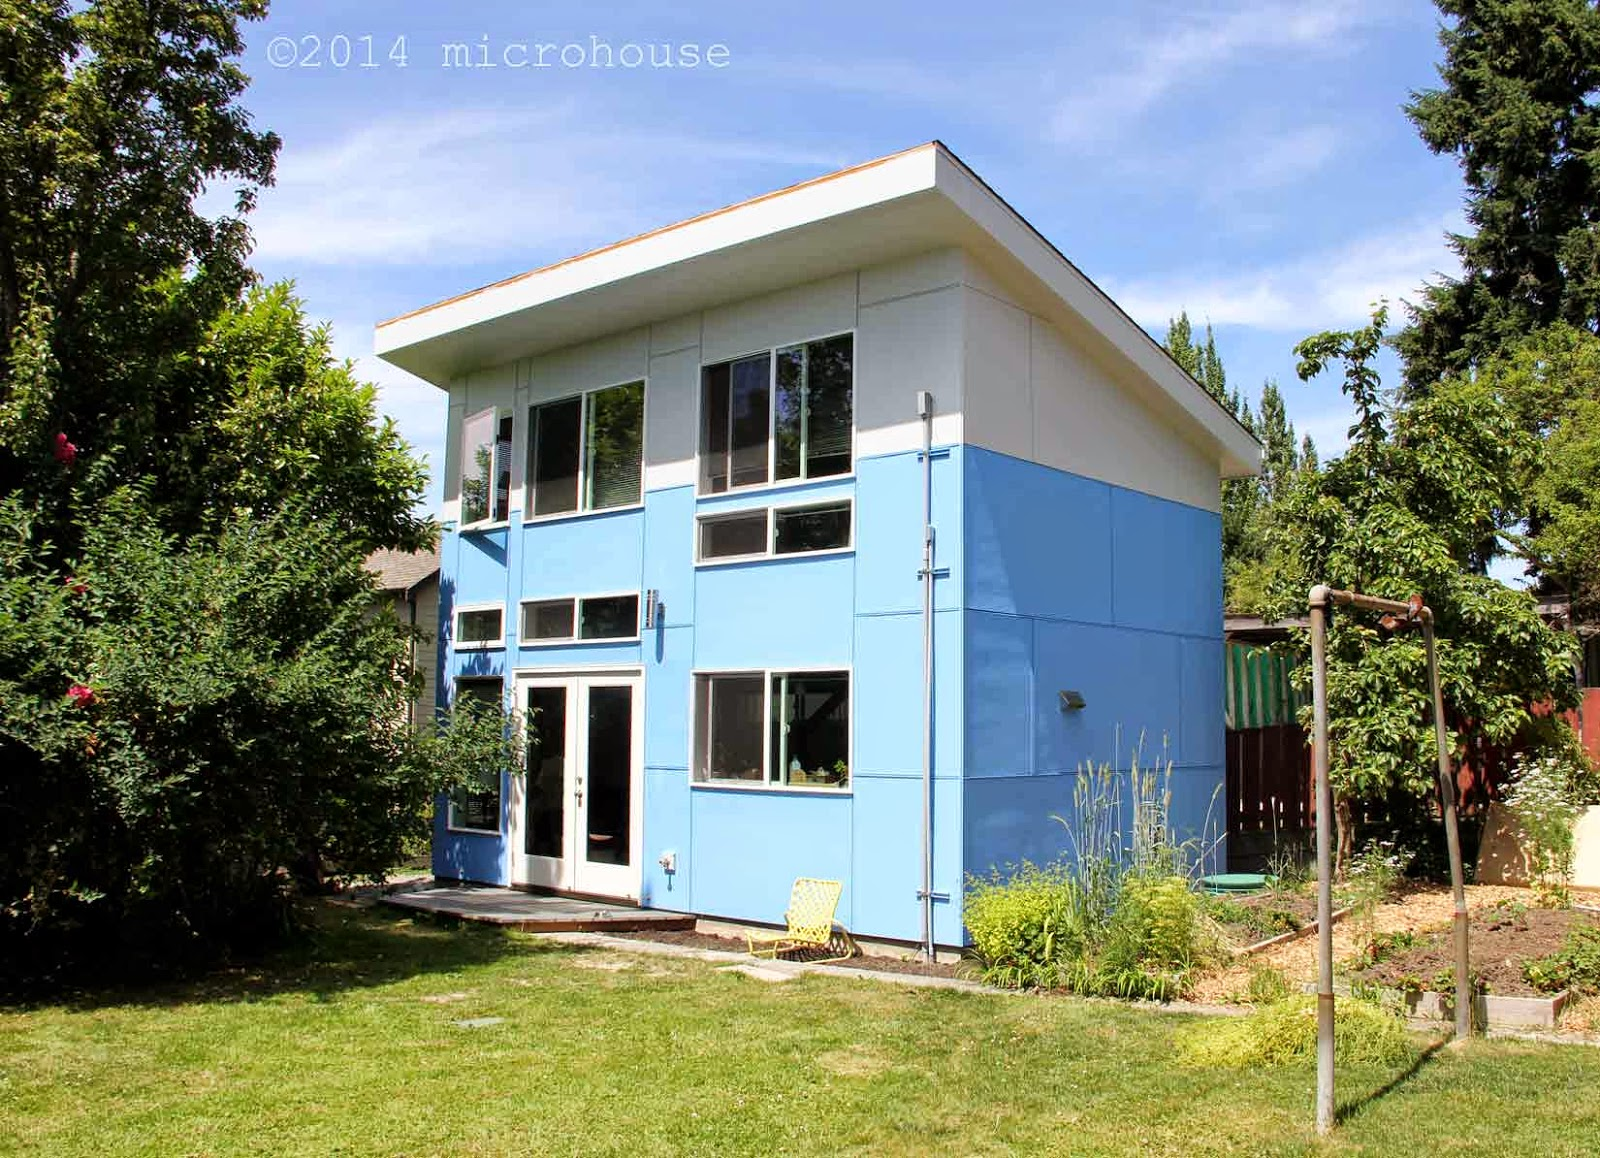 backyard cottage, microhouse, dadu